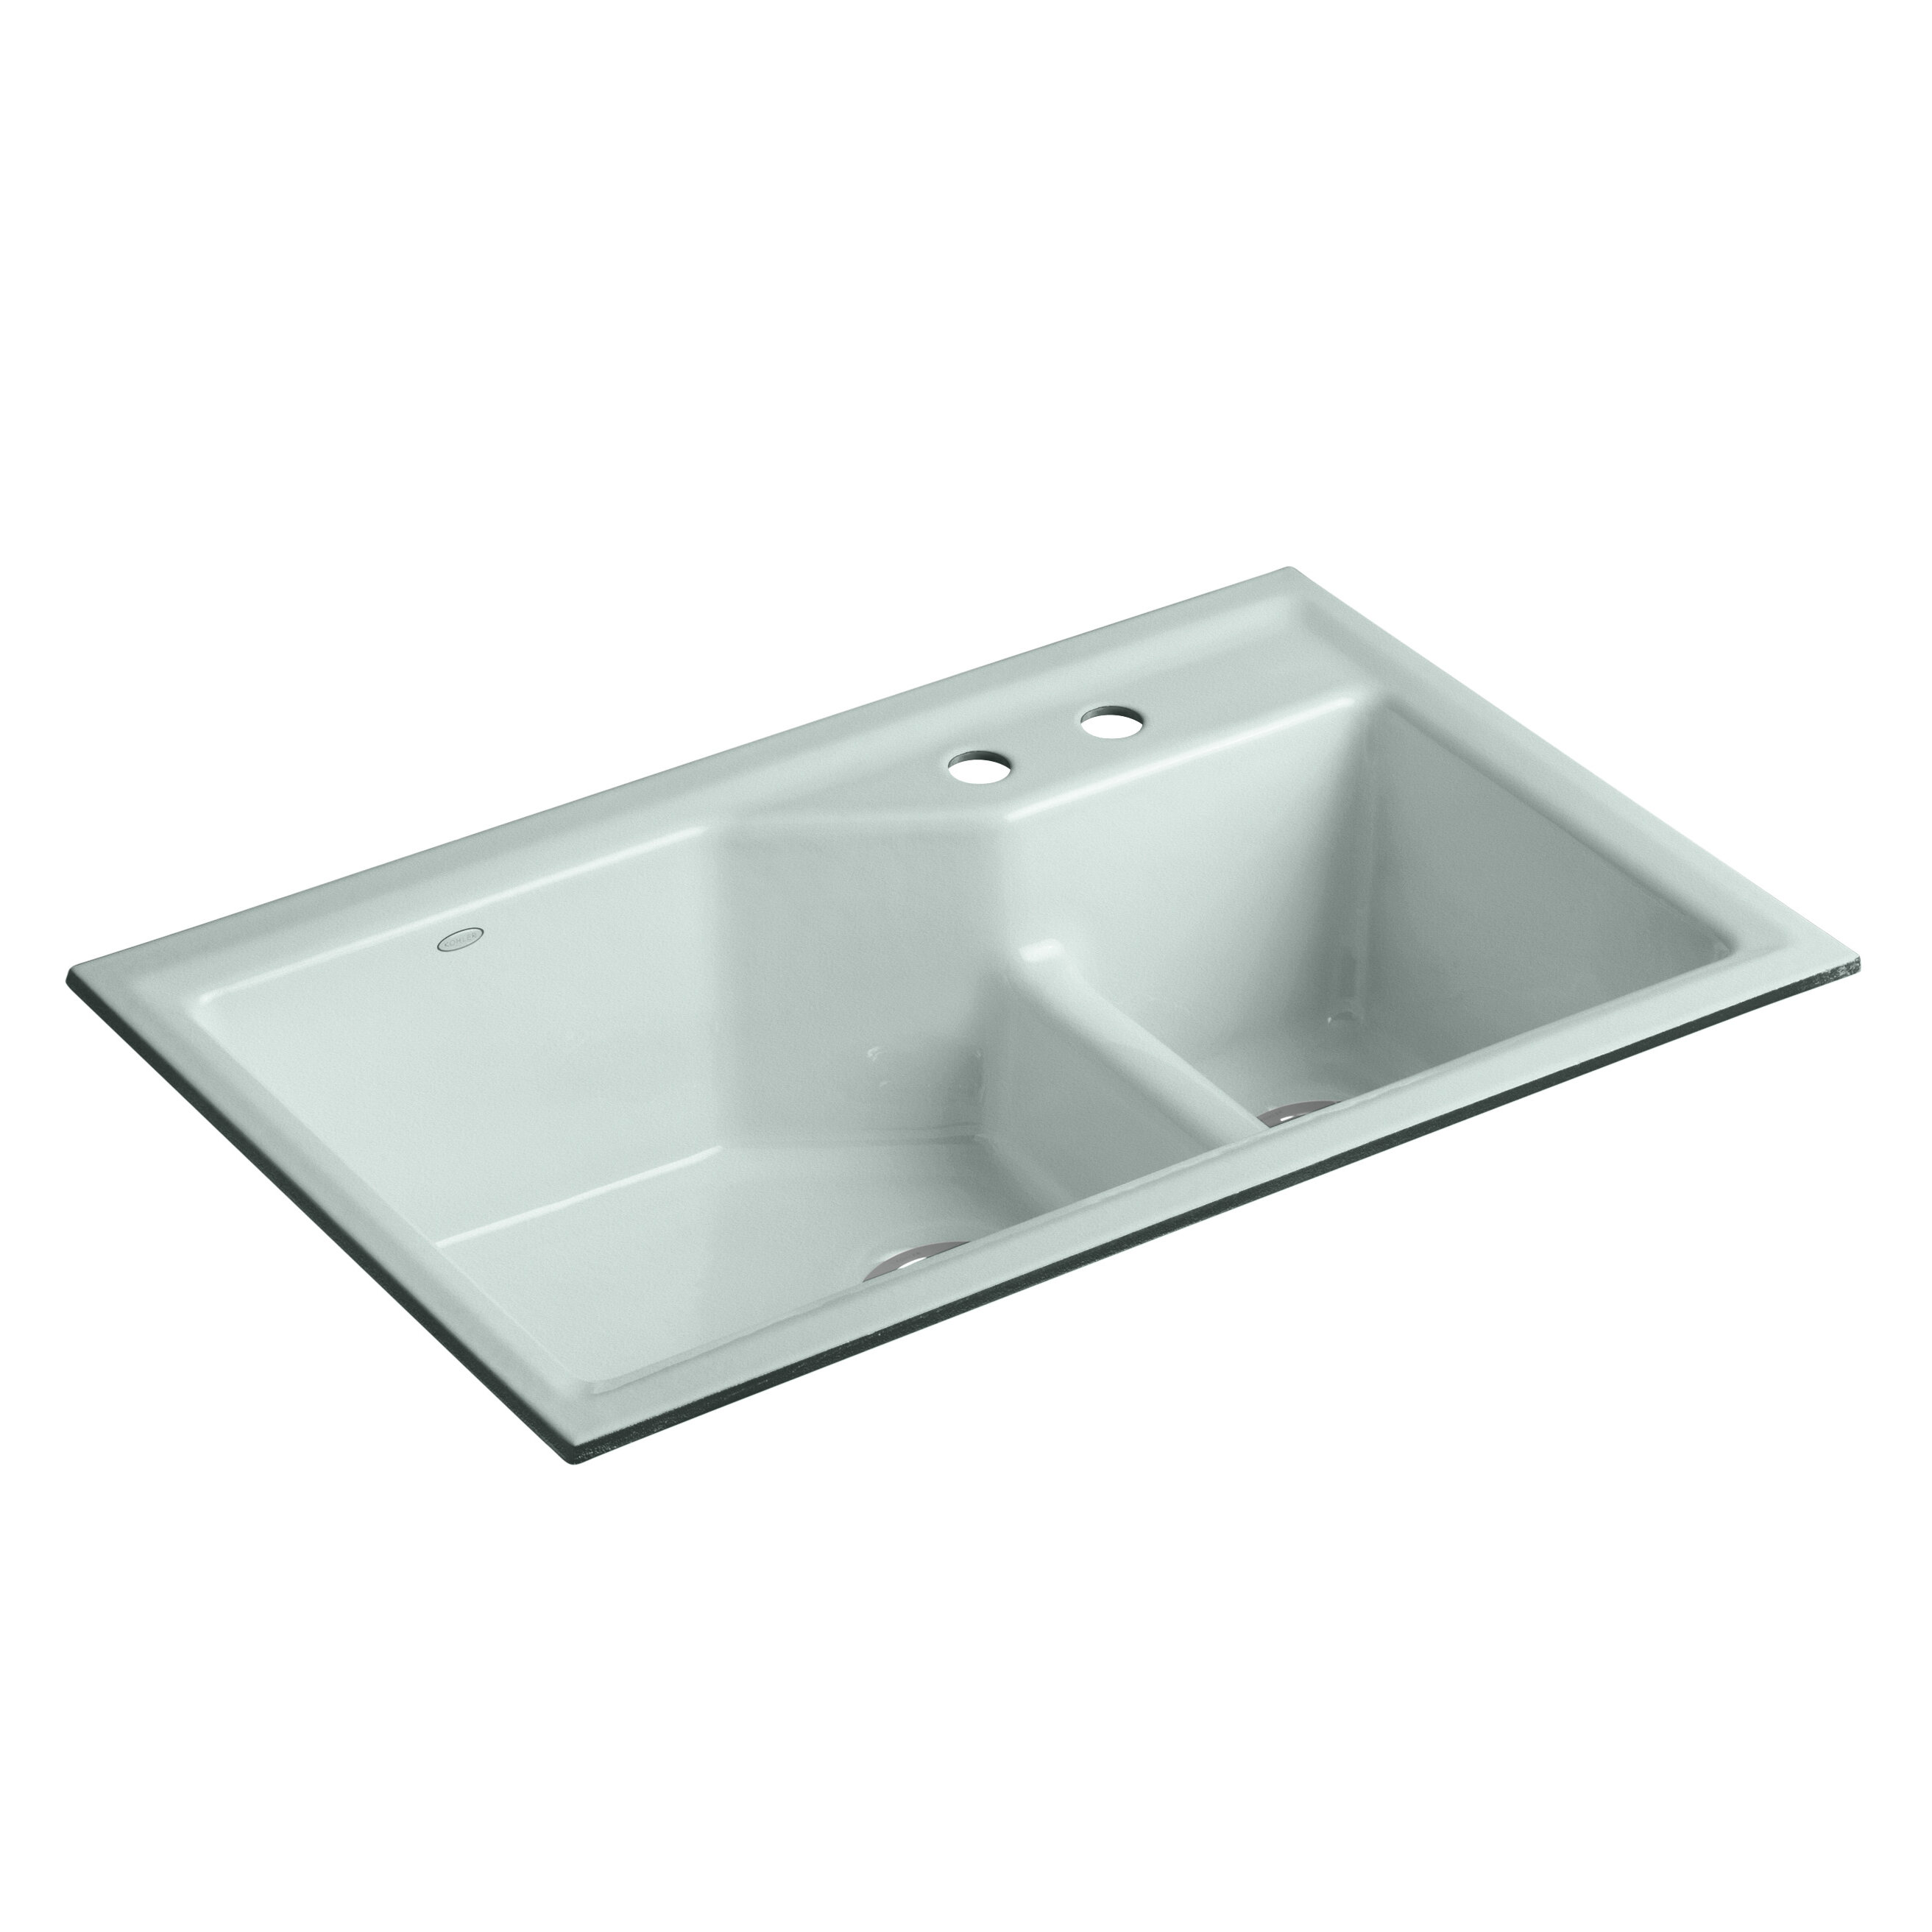 Kohler Indio 33  L x 21-1/8  W x 9-3/4  Under-Mount Smart Divide Large/Small Double-Bowl Kitchen Sink u0026 Reviews | Wayfair.ca  sc 1 st  Wayfair & Kohler Indio 33